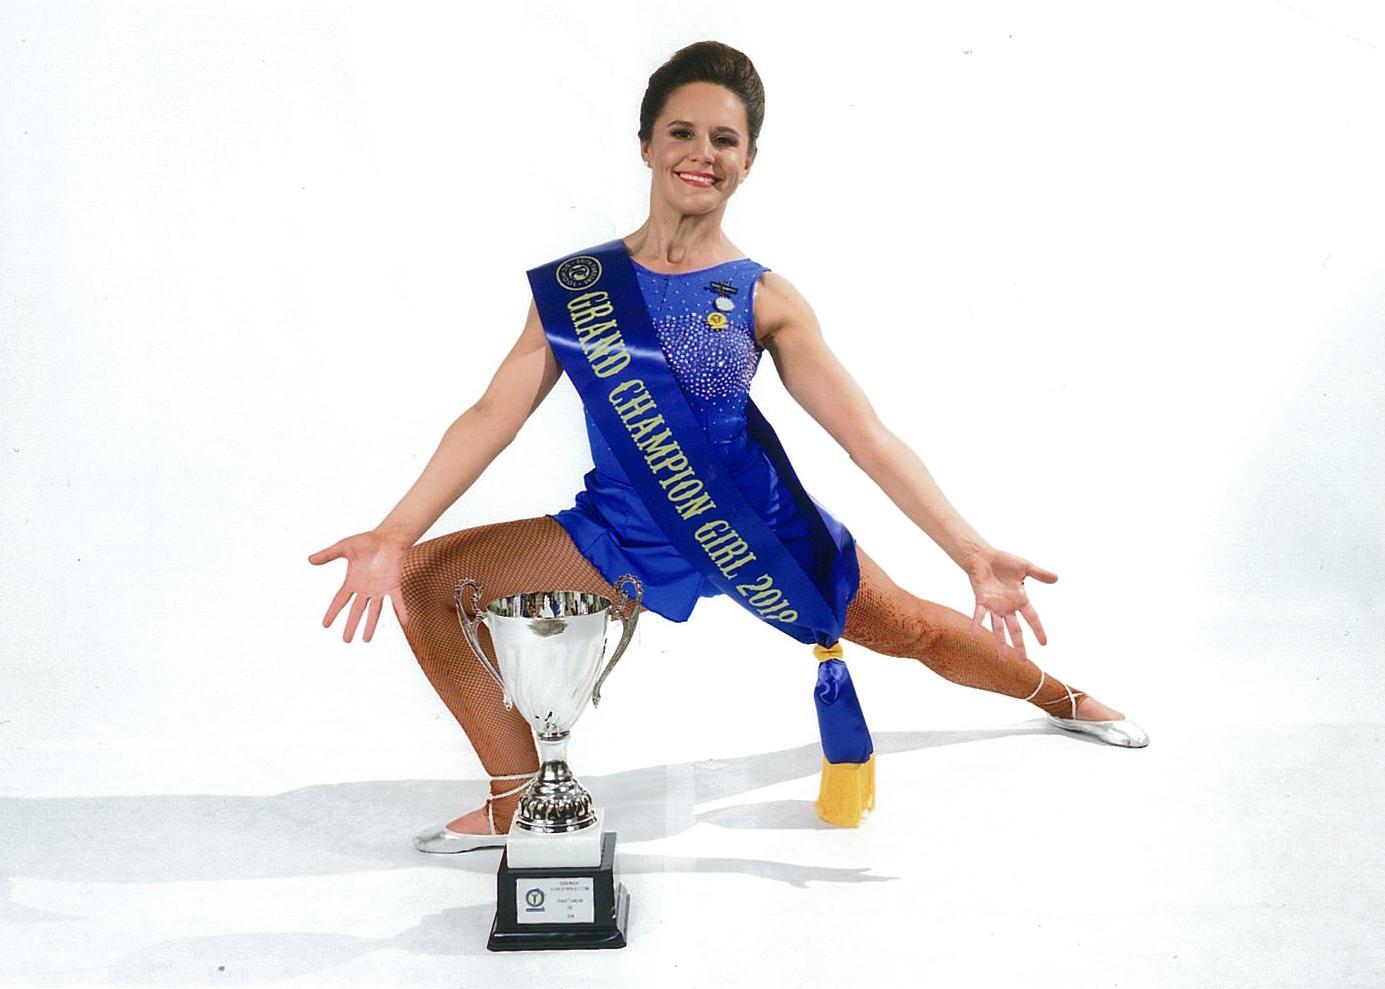 Grand Champion Girl 2018, Talia